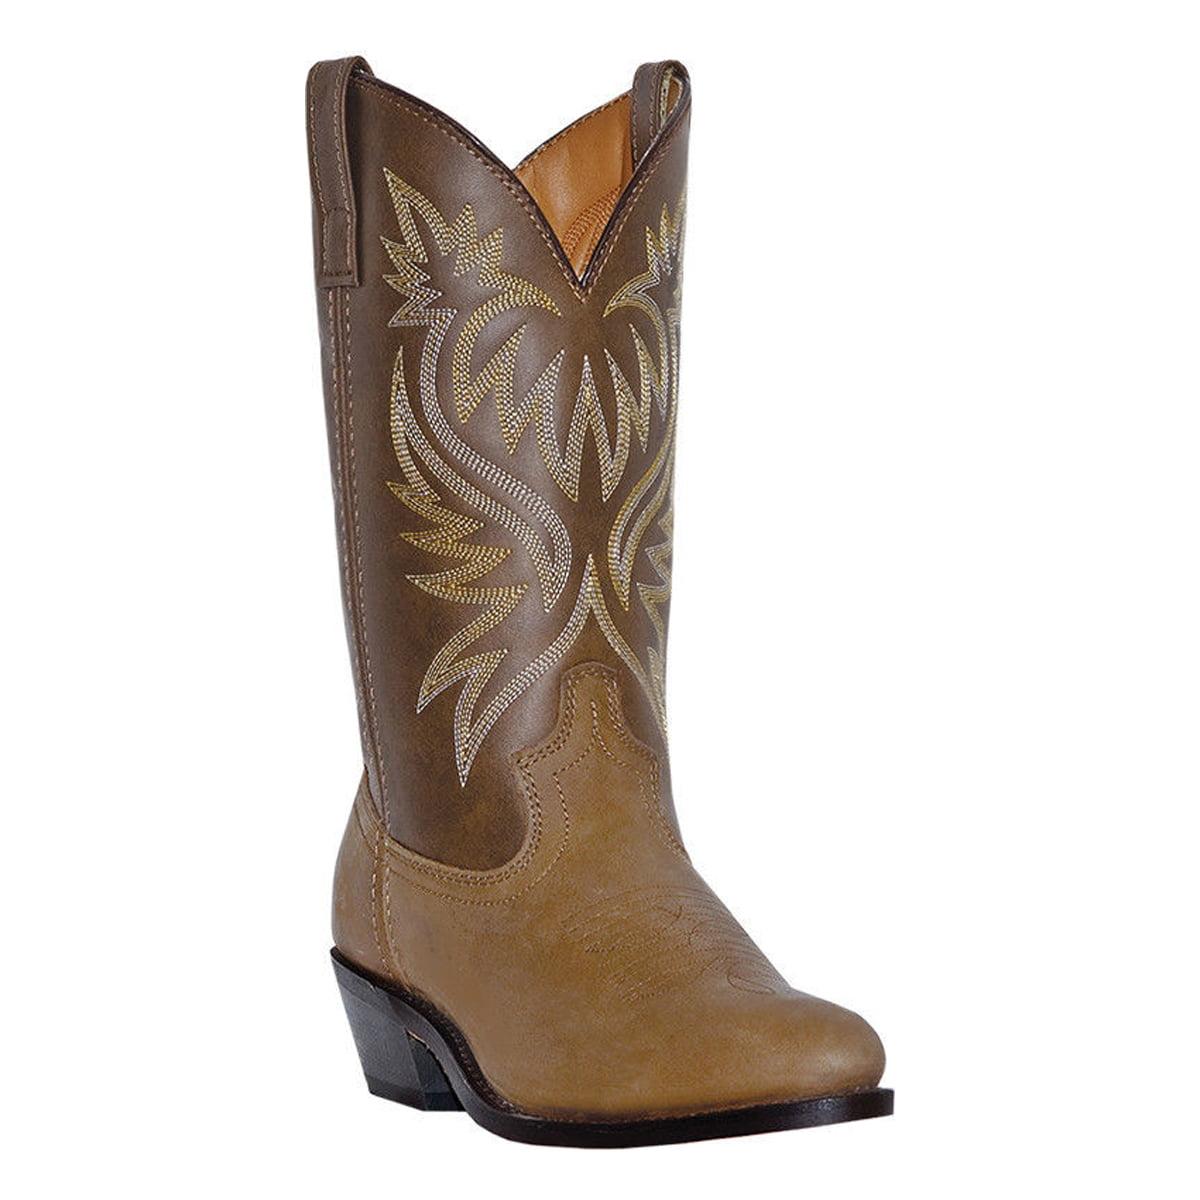 Click here to buy Laredo 4212 Men